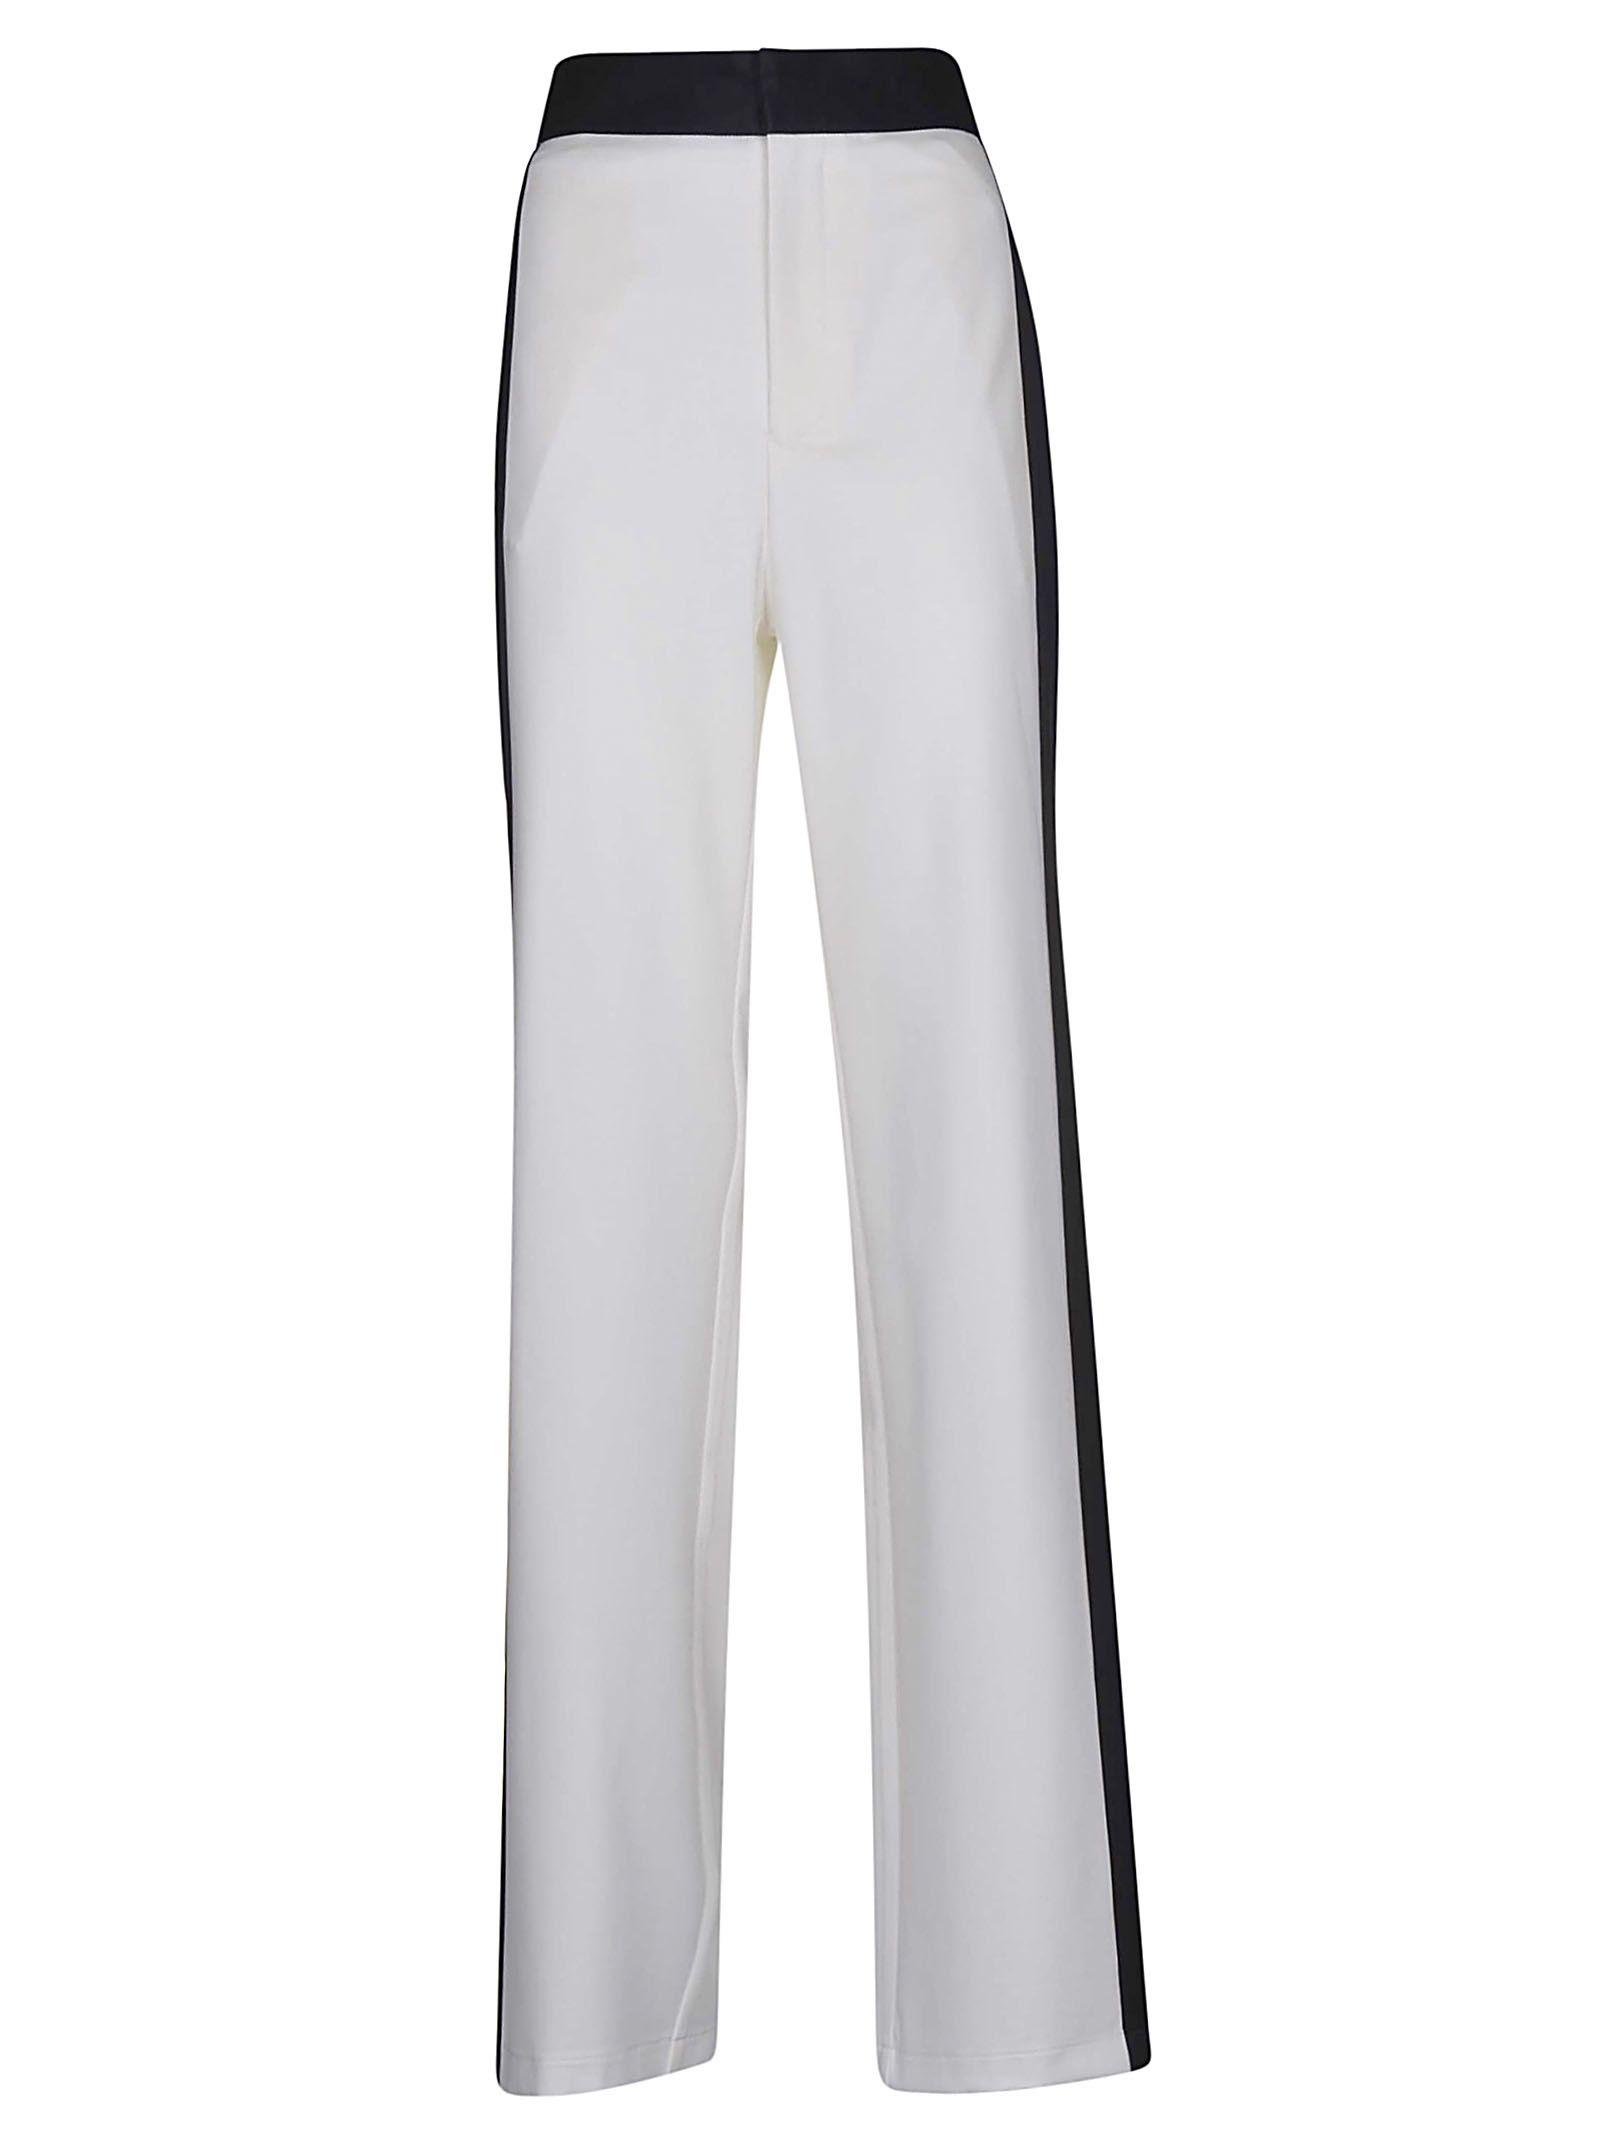 Maison Margiela Paris High Waist Trousers